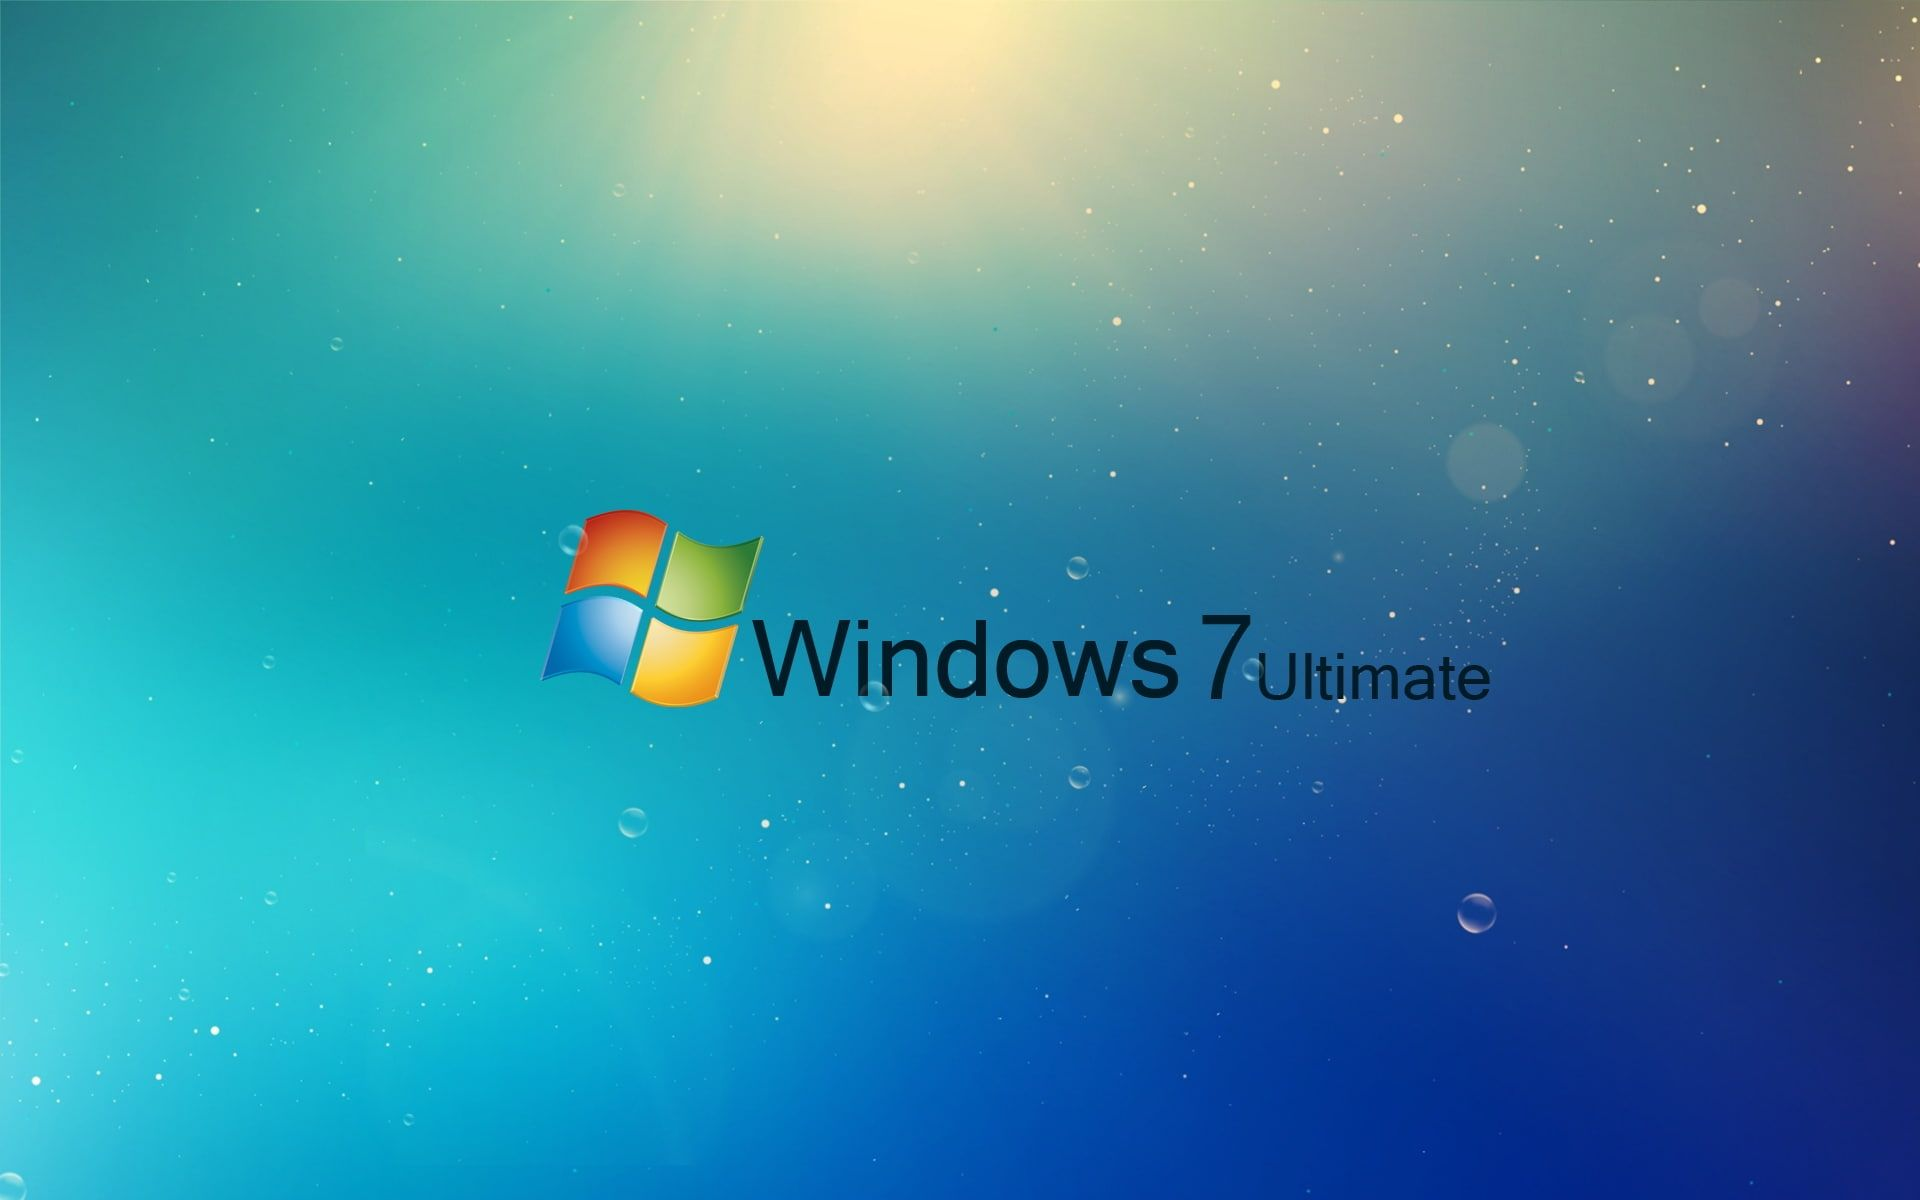 Windows 7 Ultimate Blue 1080p Wallpaper Hdwallpaper Desktop Download Wallpapers For Pc Wallpaper Pc Windows Wallpaper